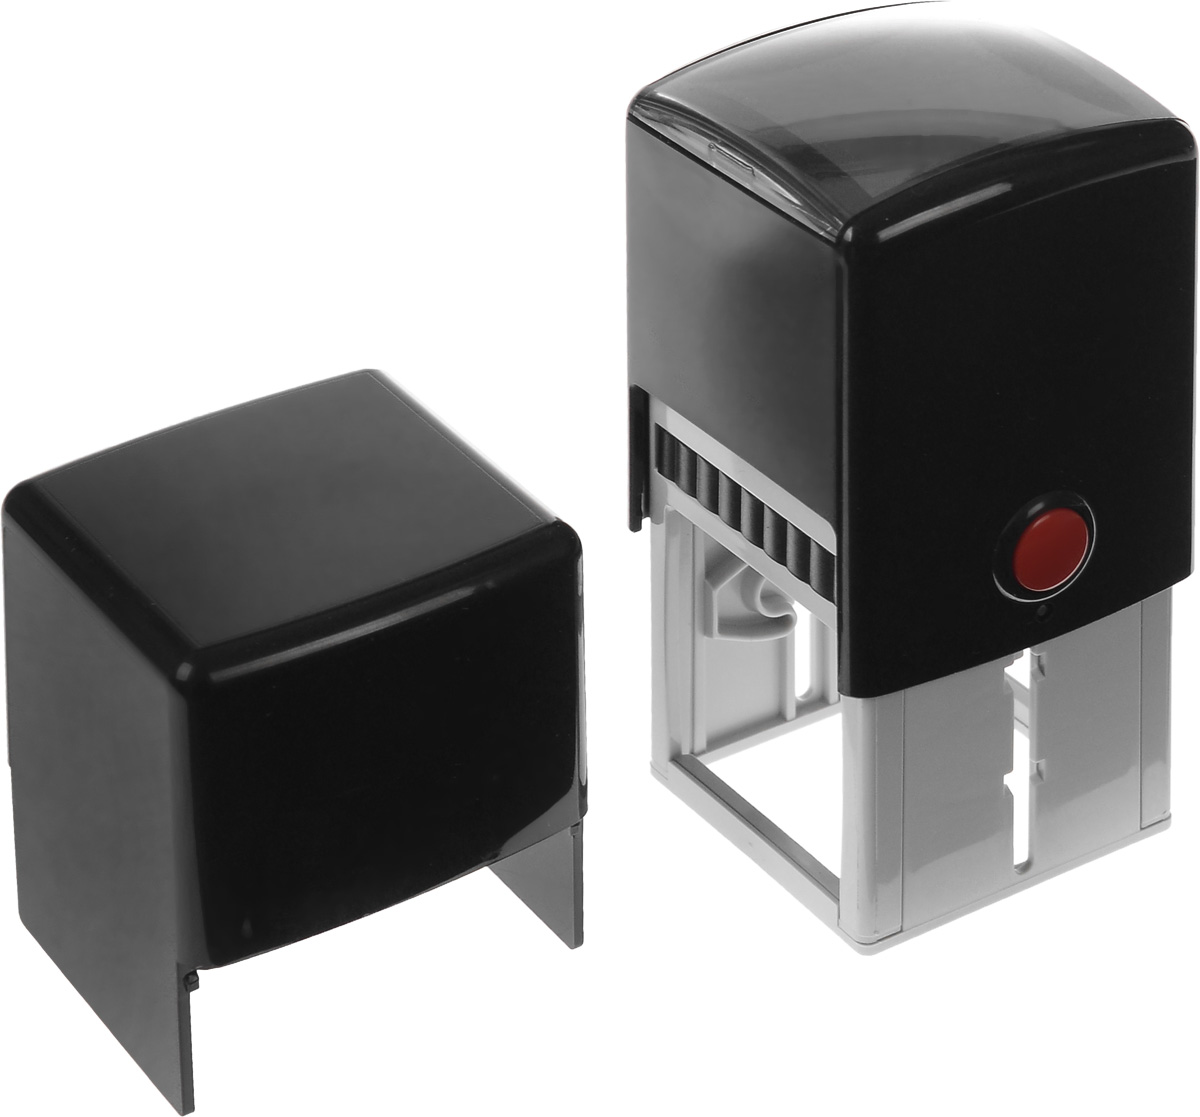 Trodat Оснастка для штампа 40 х 40 мм -  Штемпельная продукция